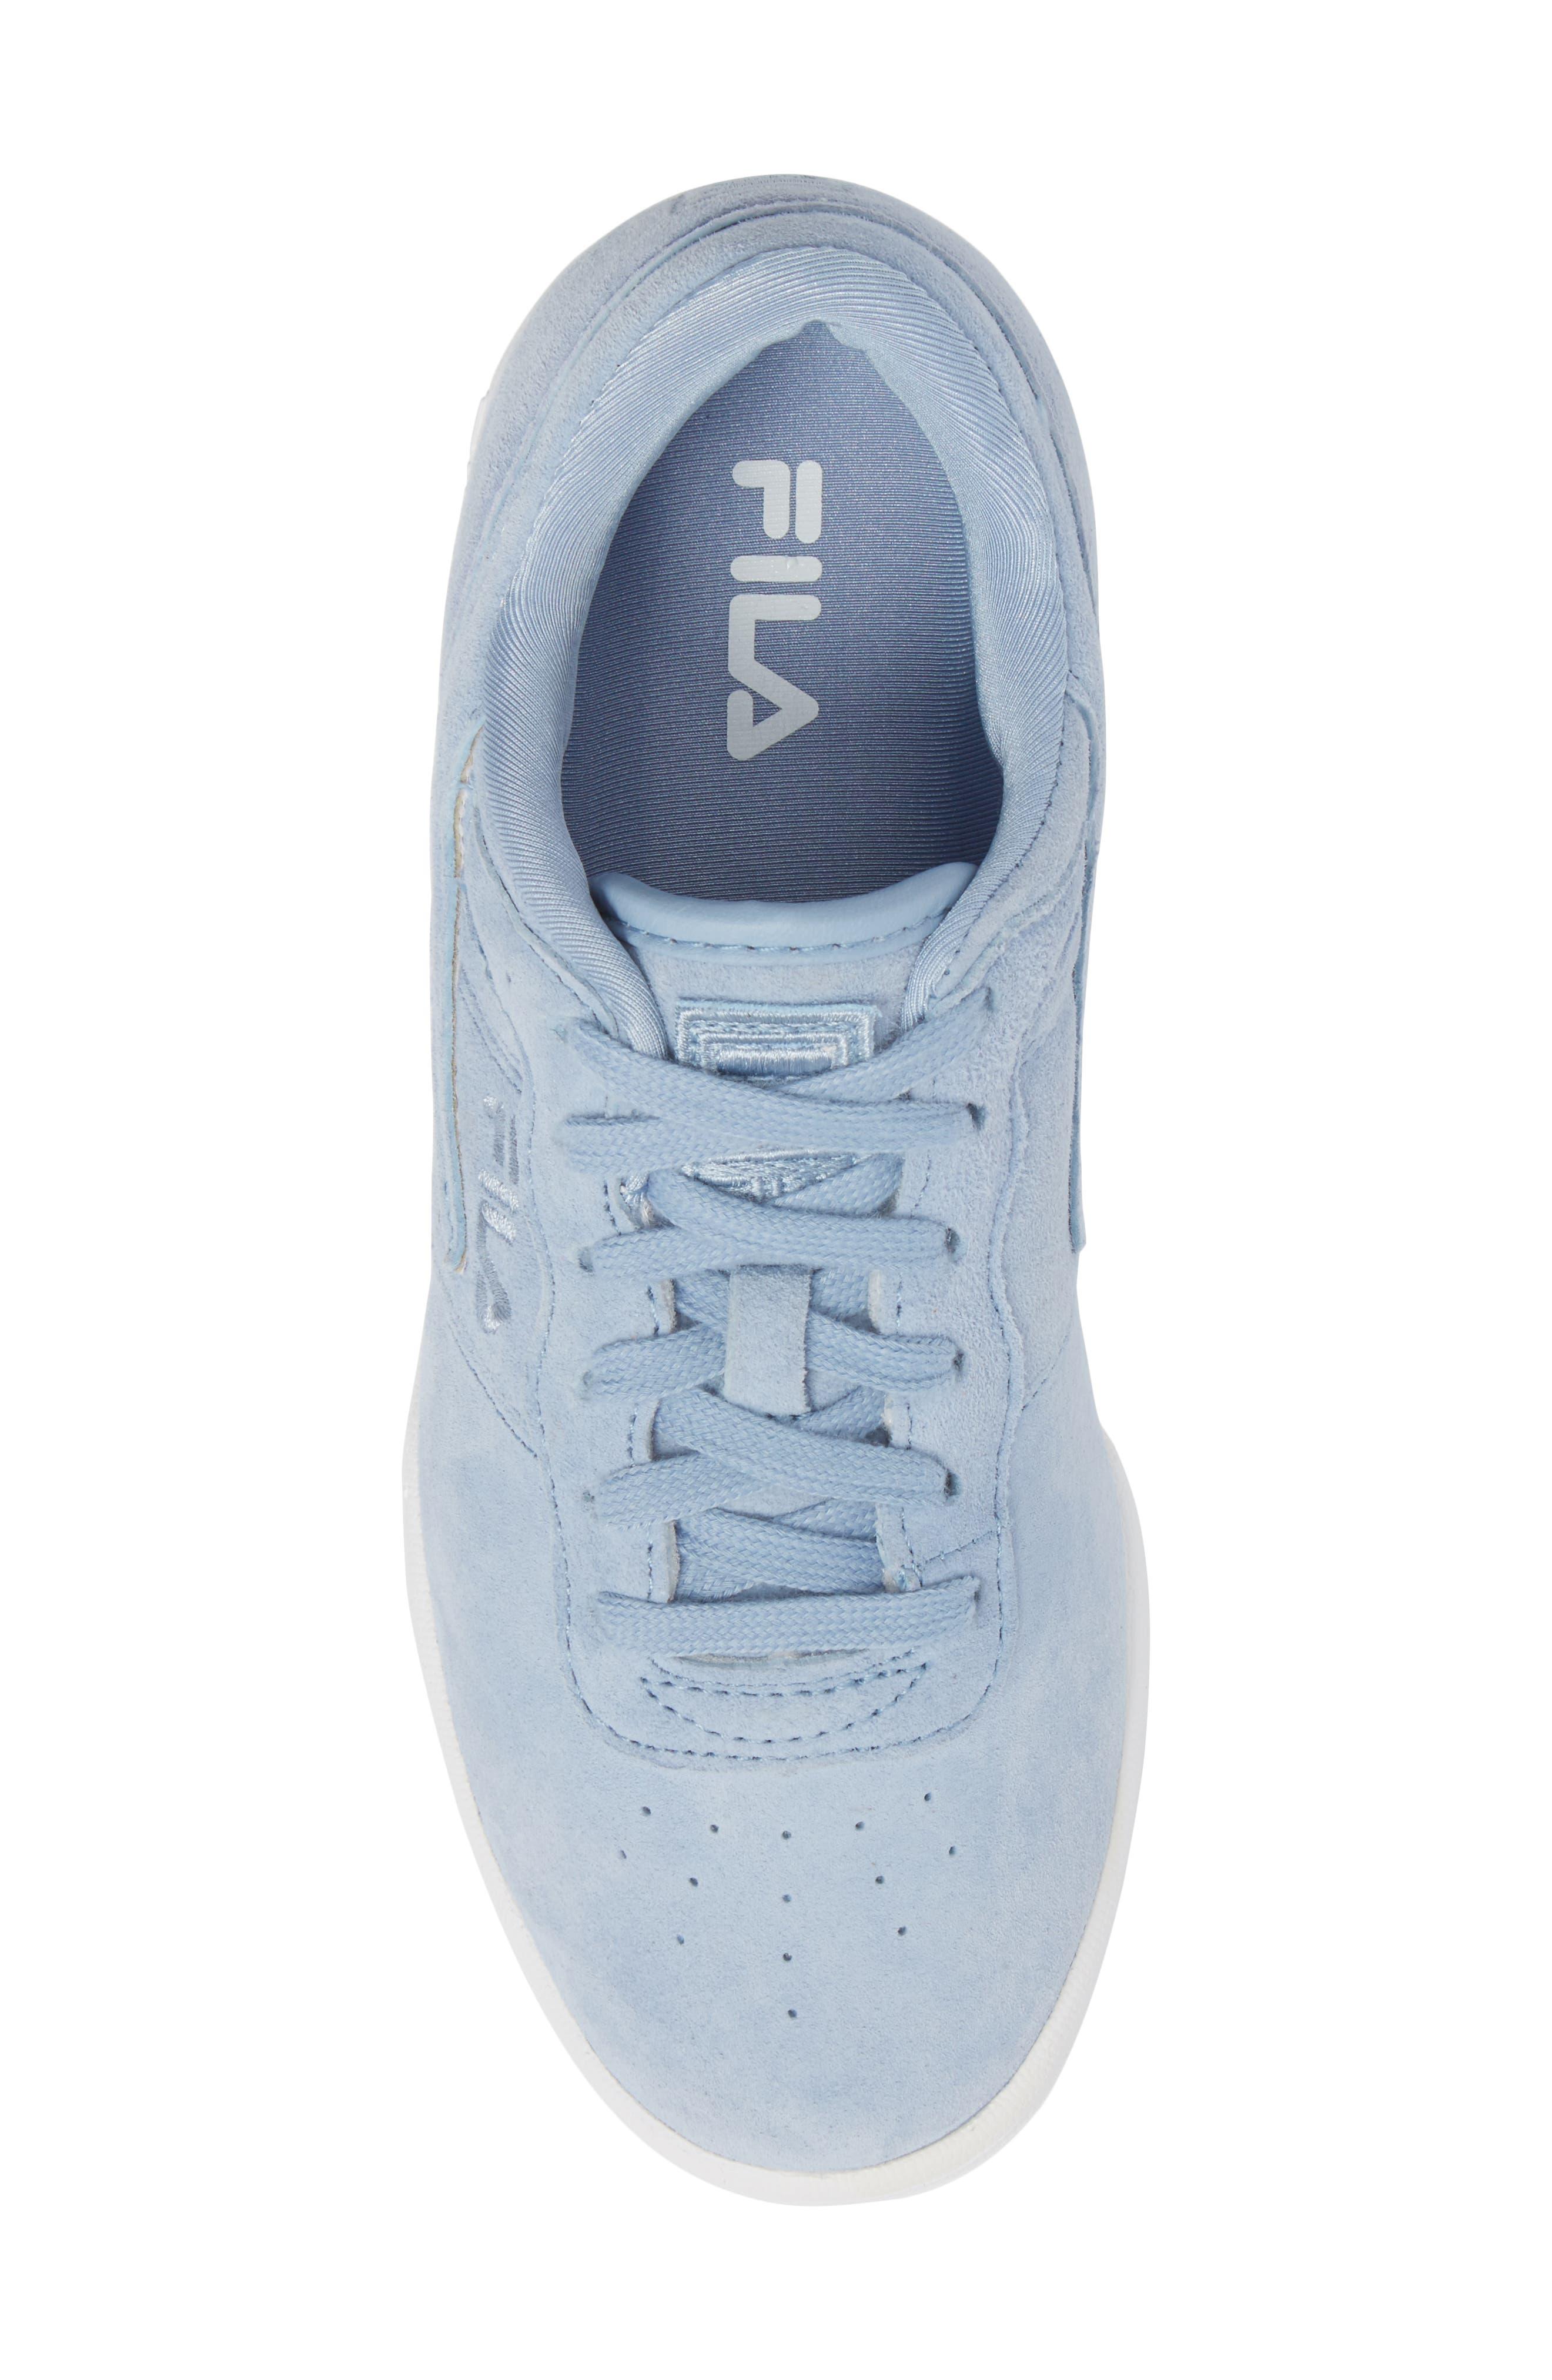 Original Fitness Premium Sneaker,                             Alternate thumbnail 5, color,                             BLUE/ WHITE